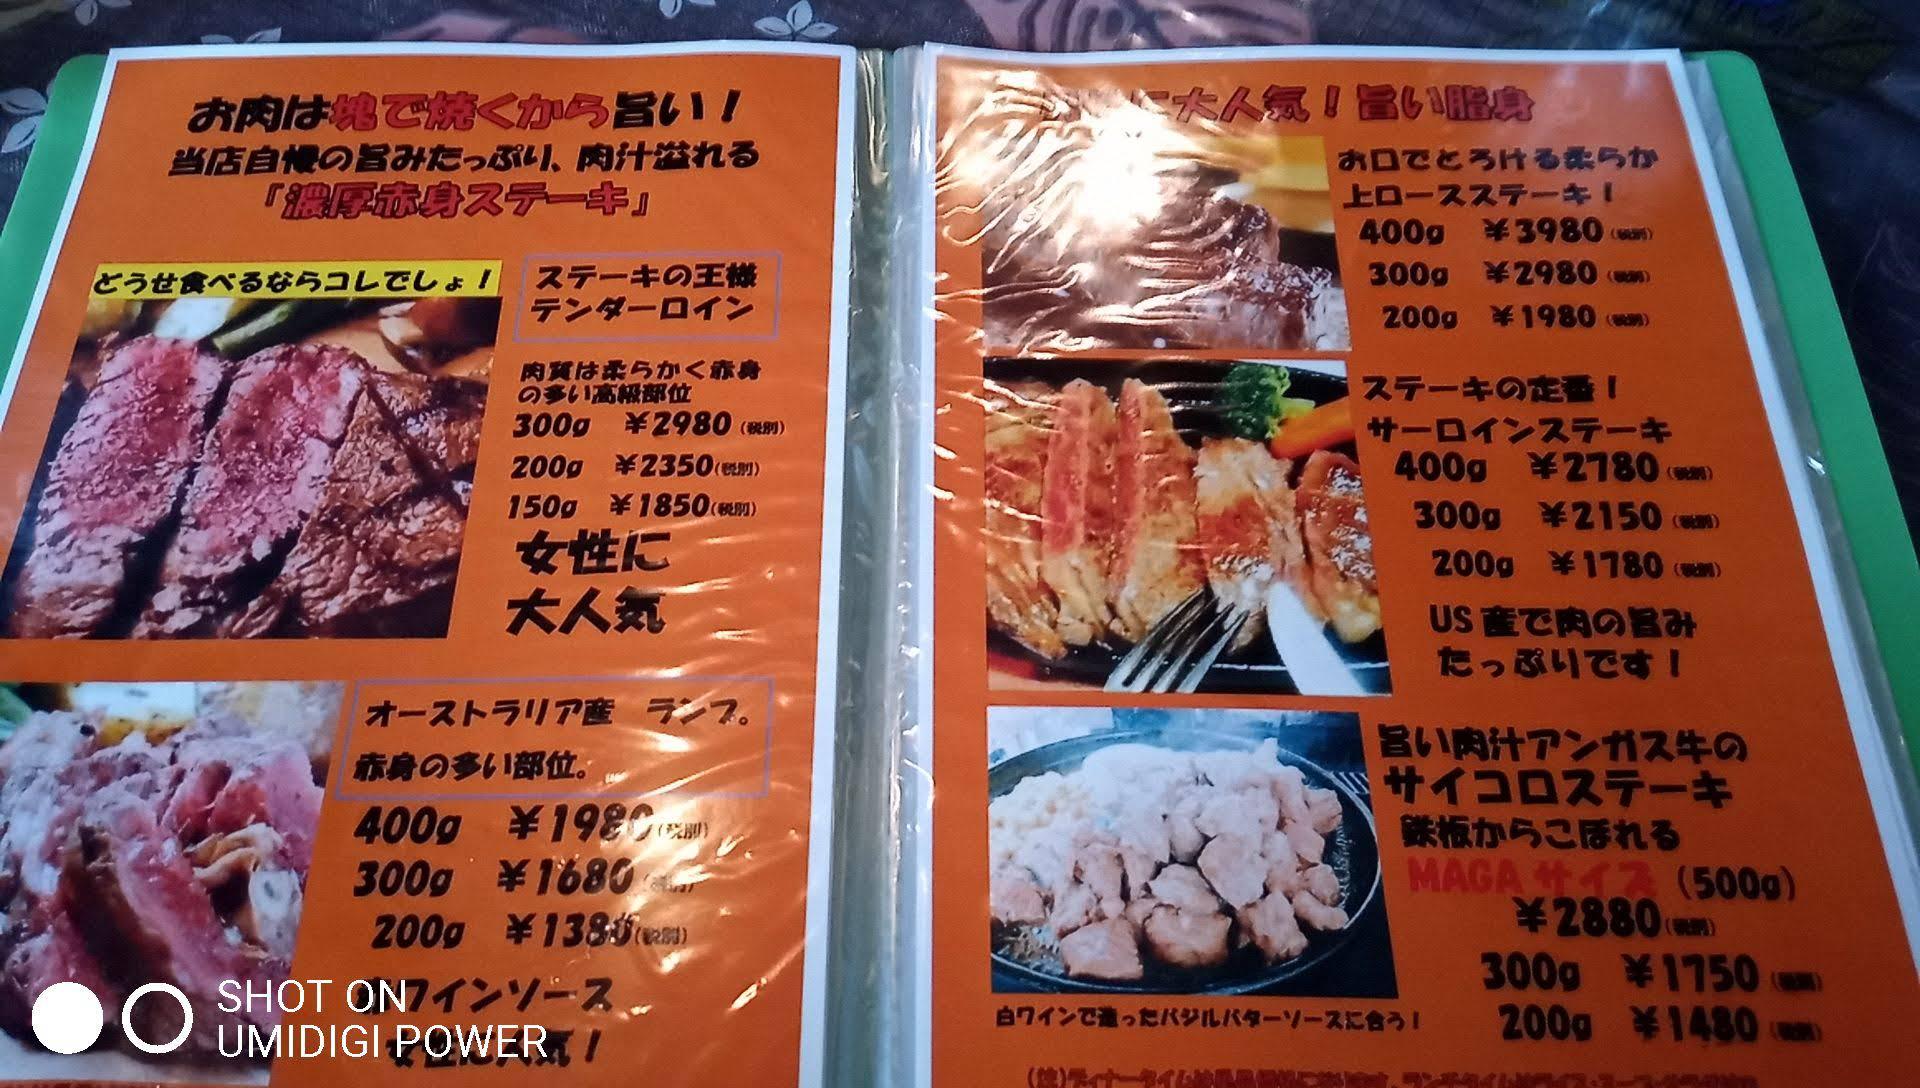 the menu of Meat Bar Hikiy's 3